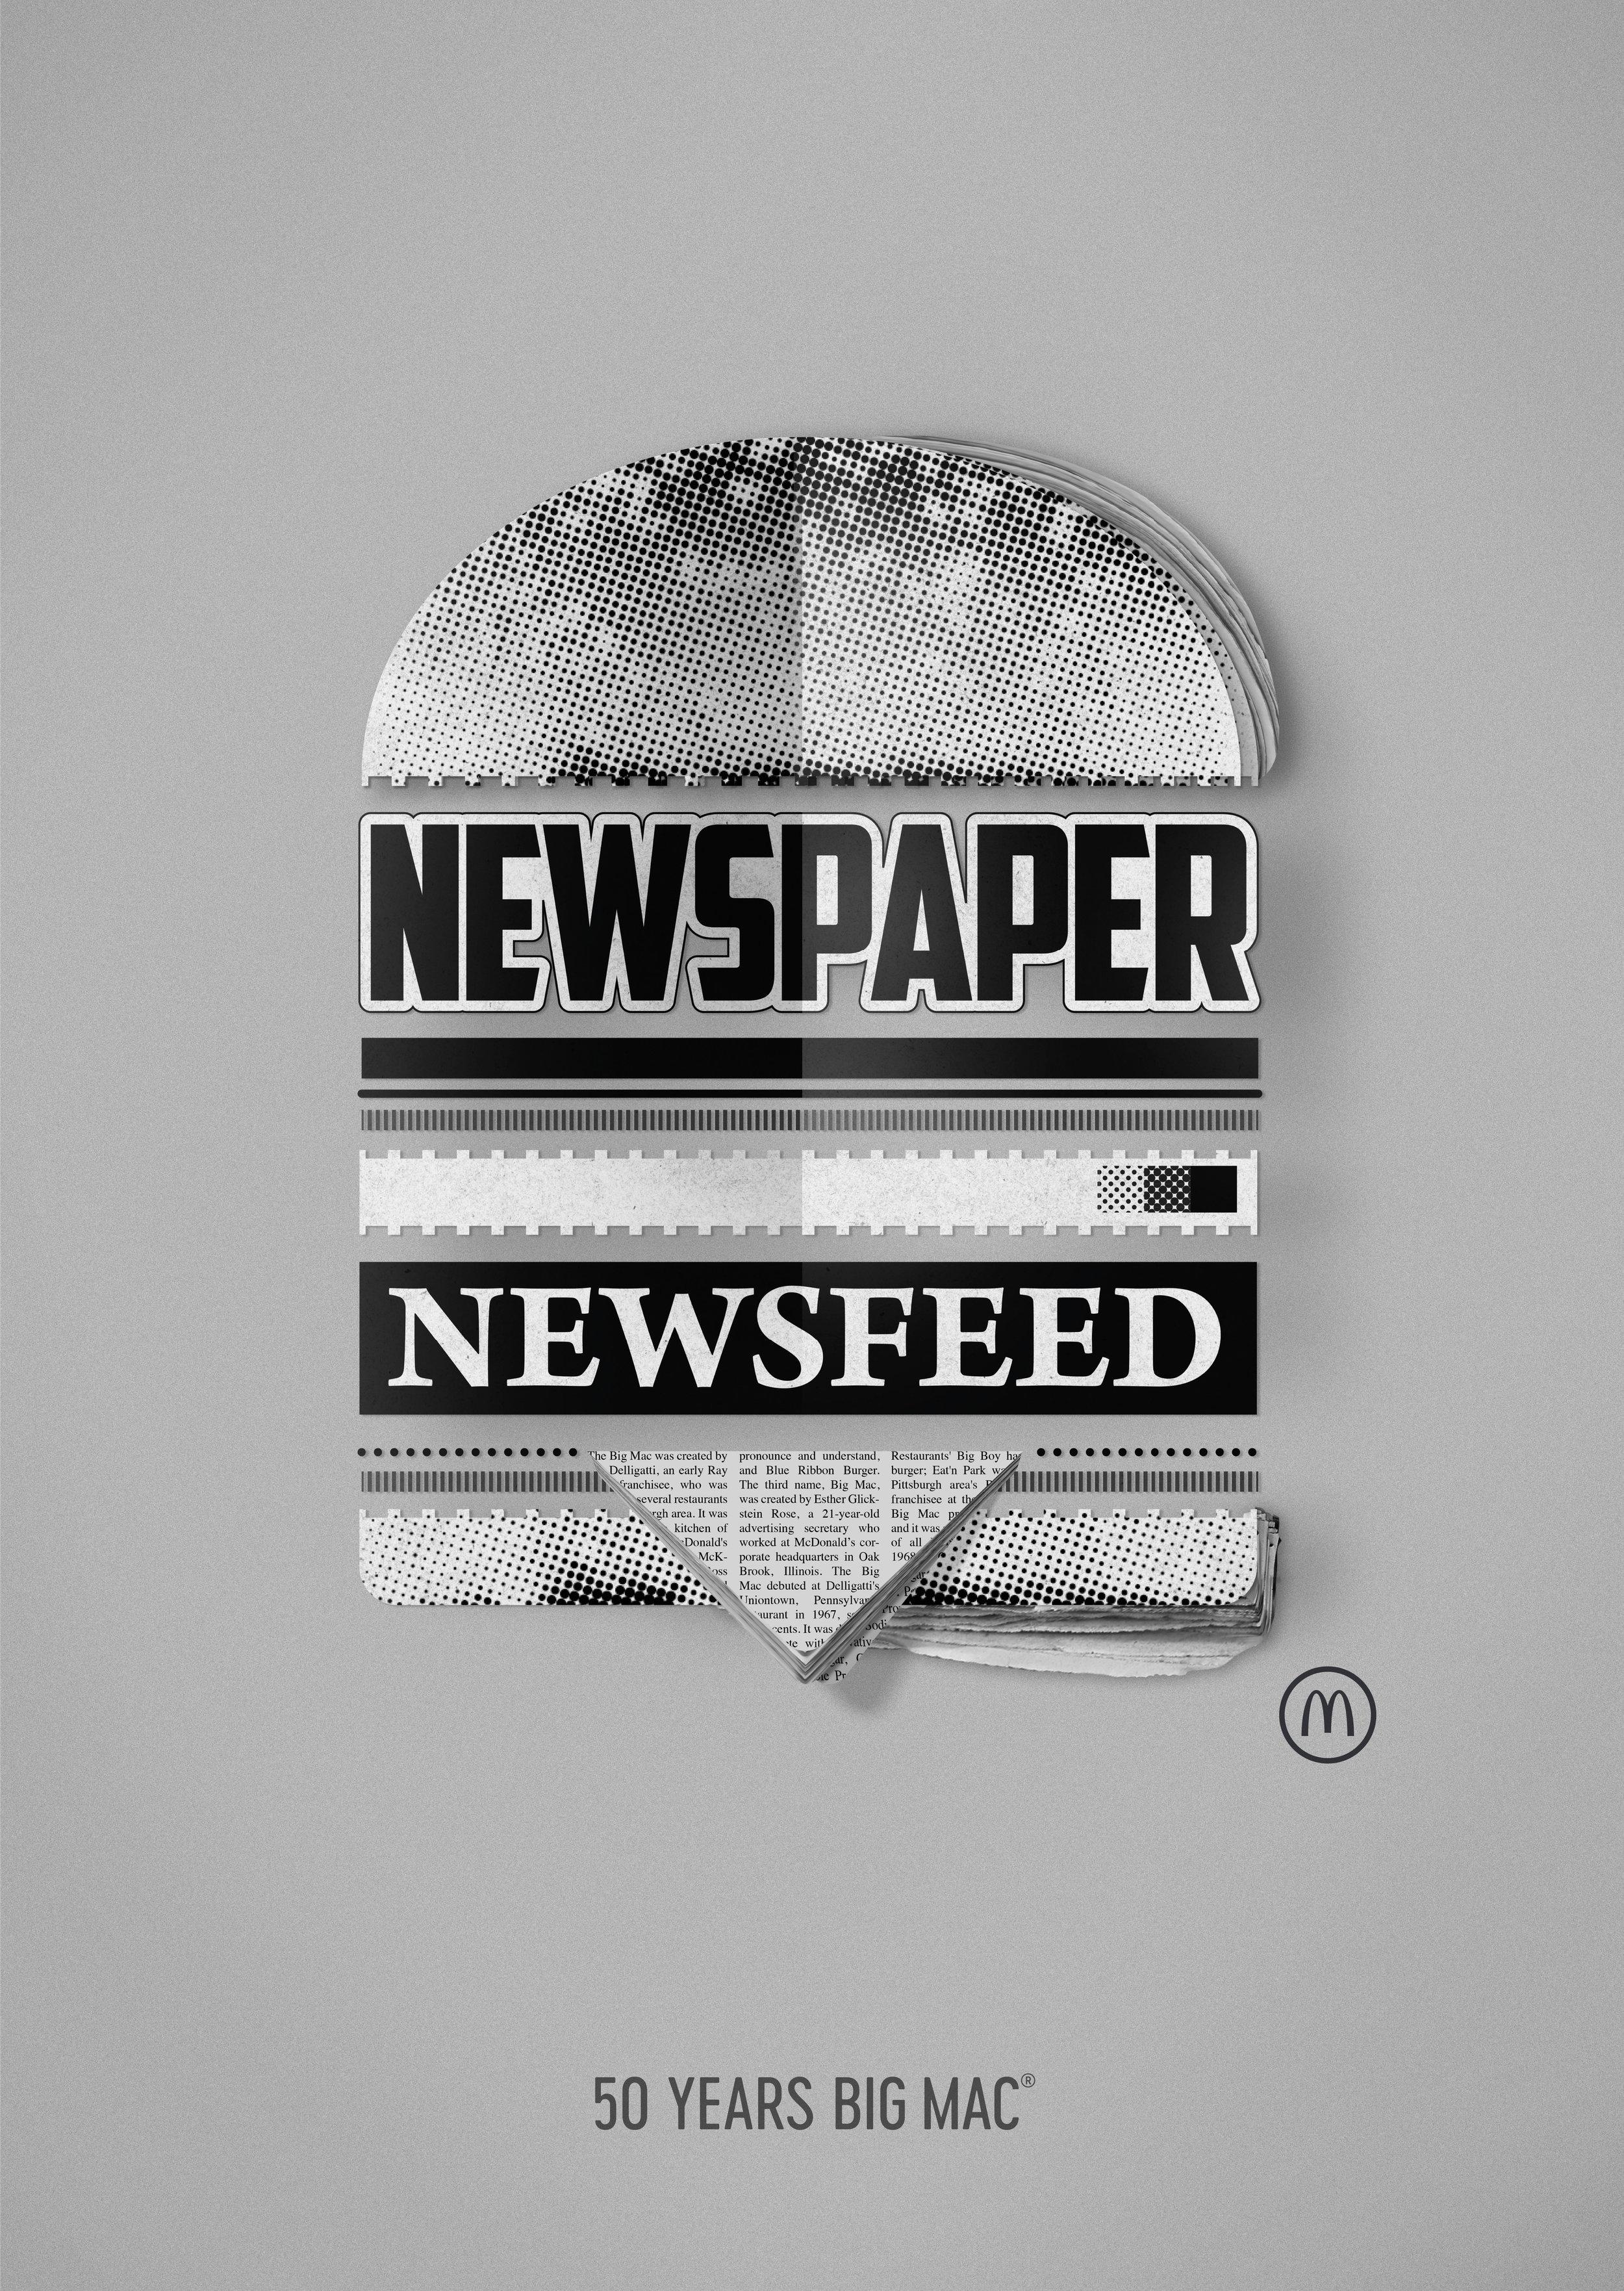 29_Newspaper:Newsfeed.jpg